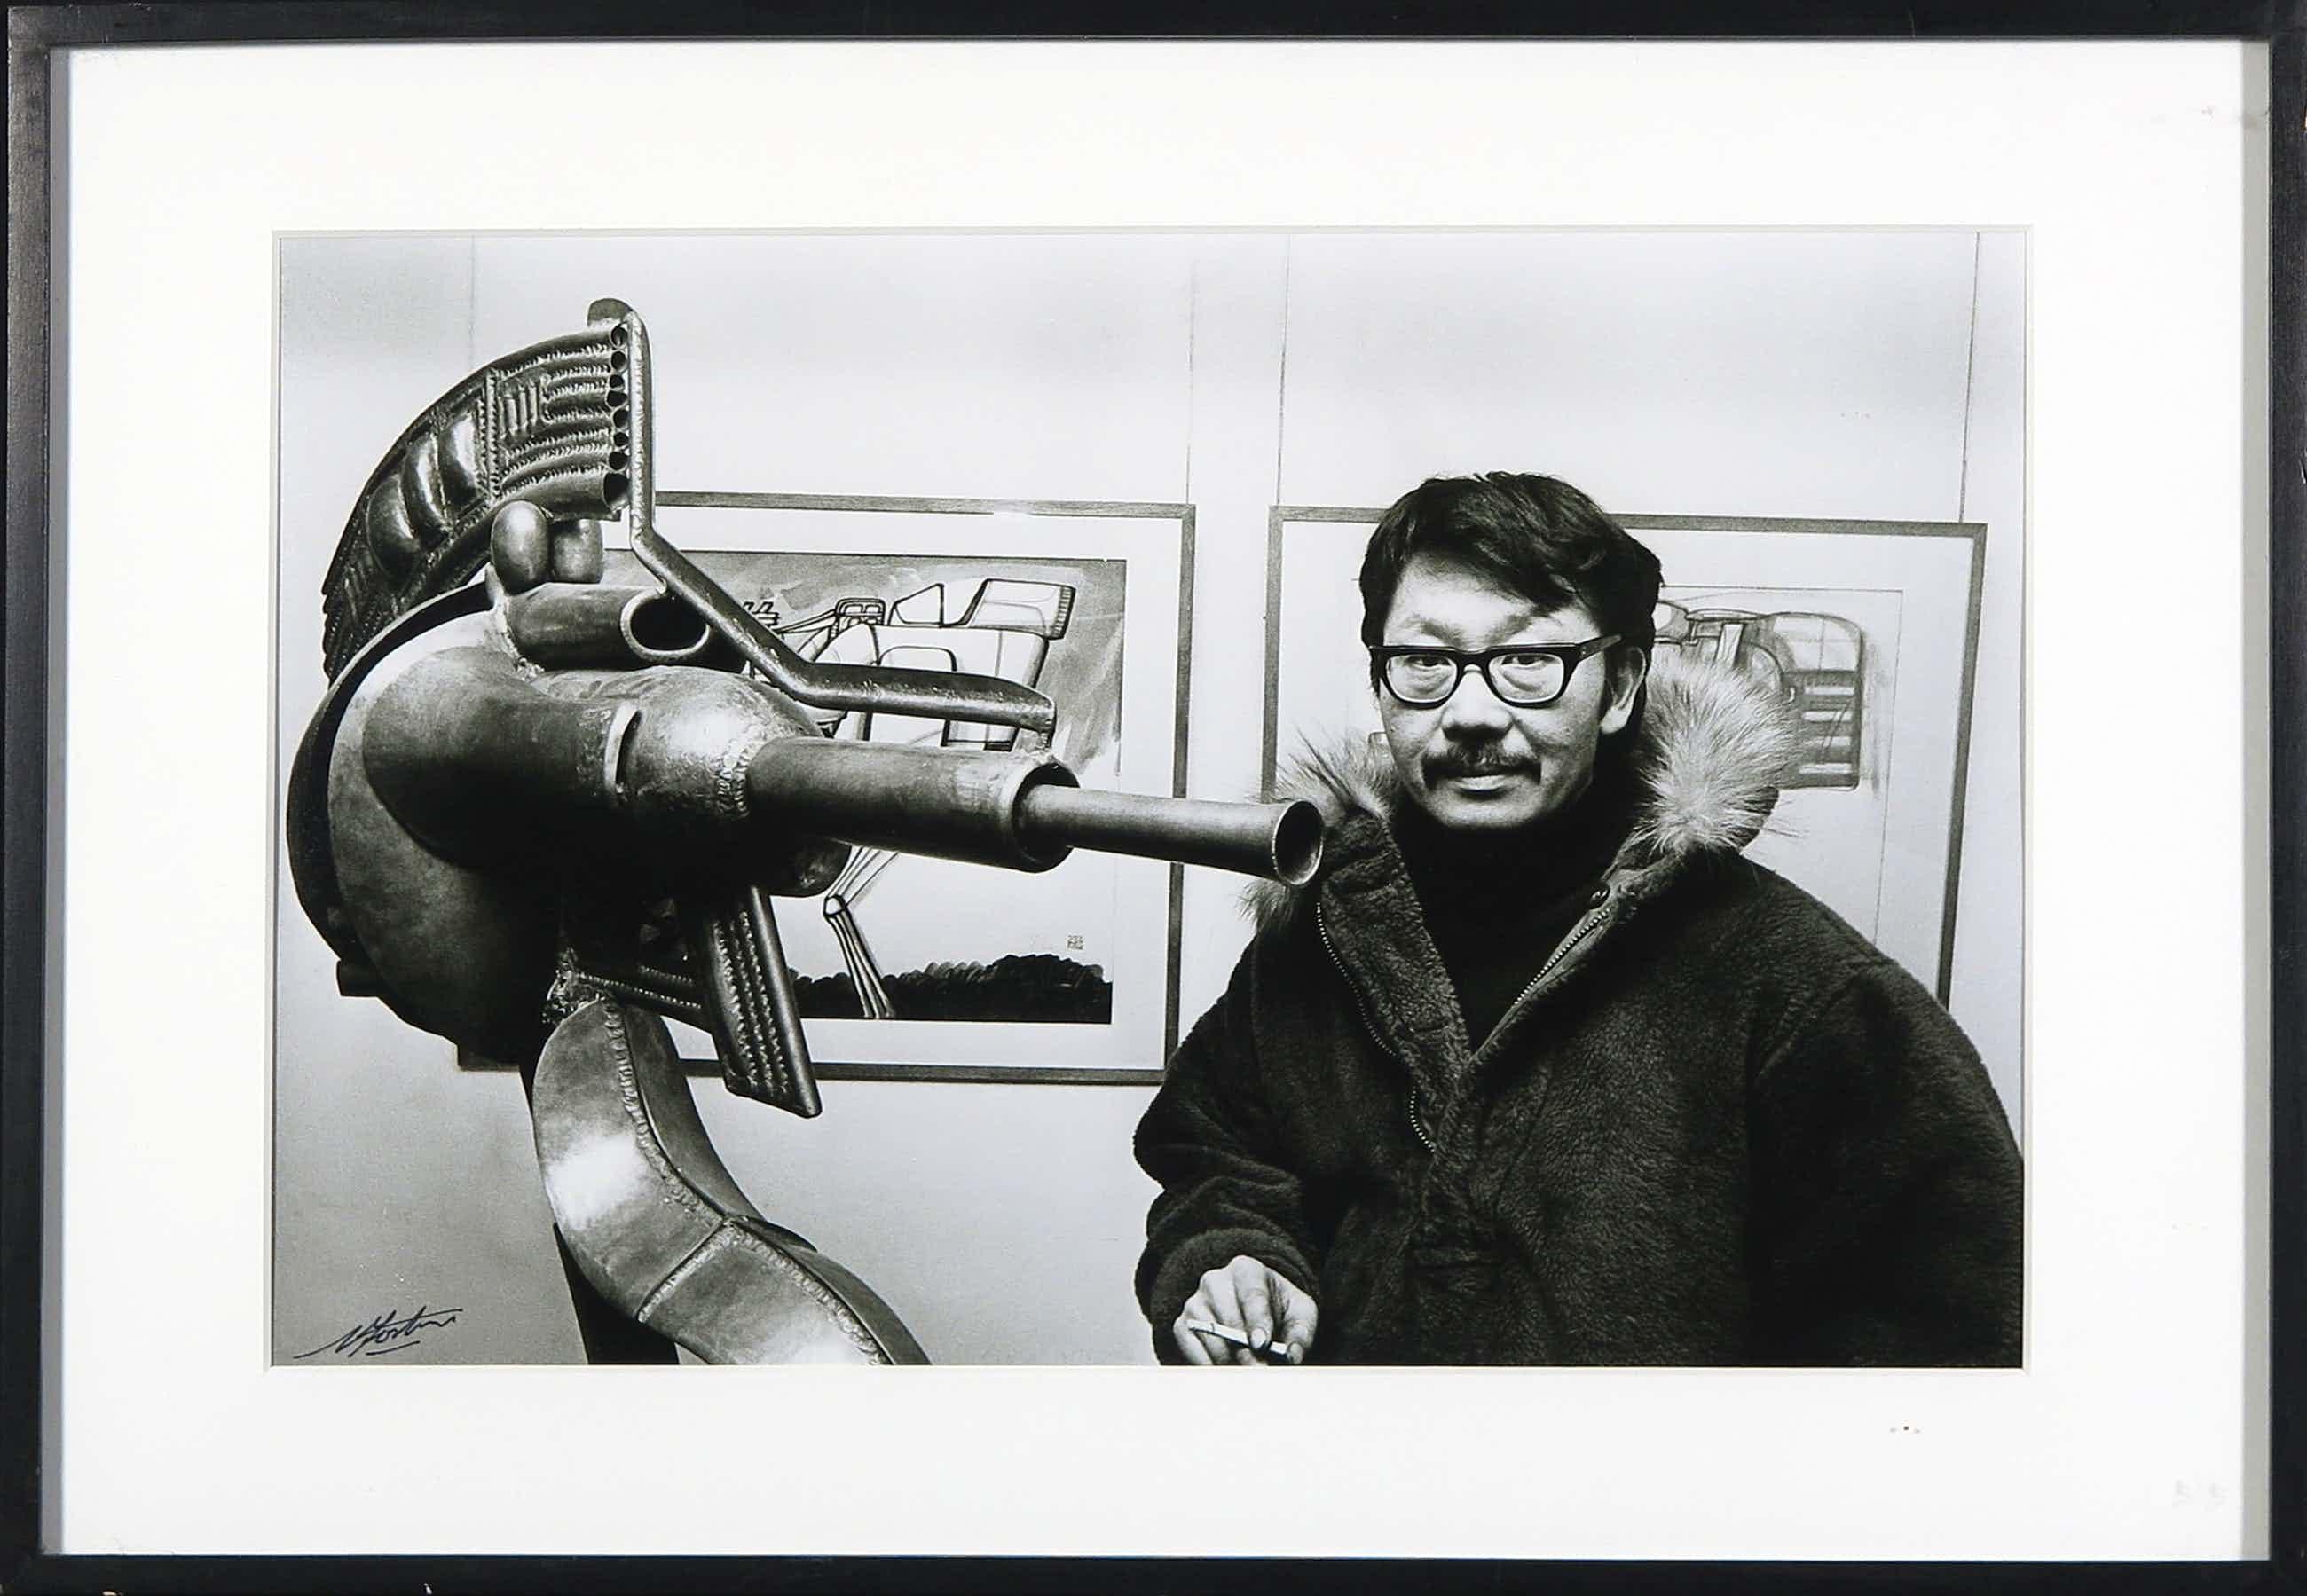 Nico Koster - Foto, Portret van Shinkichi Tajiri - Ingelijst kopen? Bied vanaf 35!